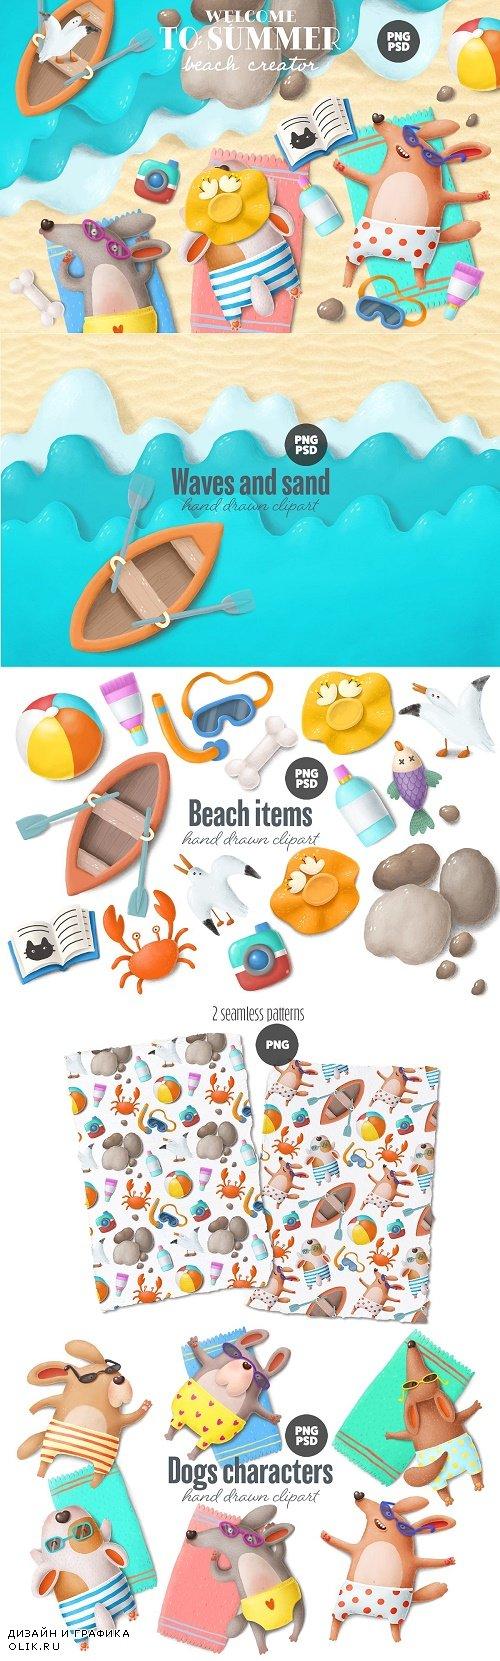 Beach creator - 3197247